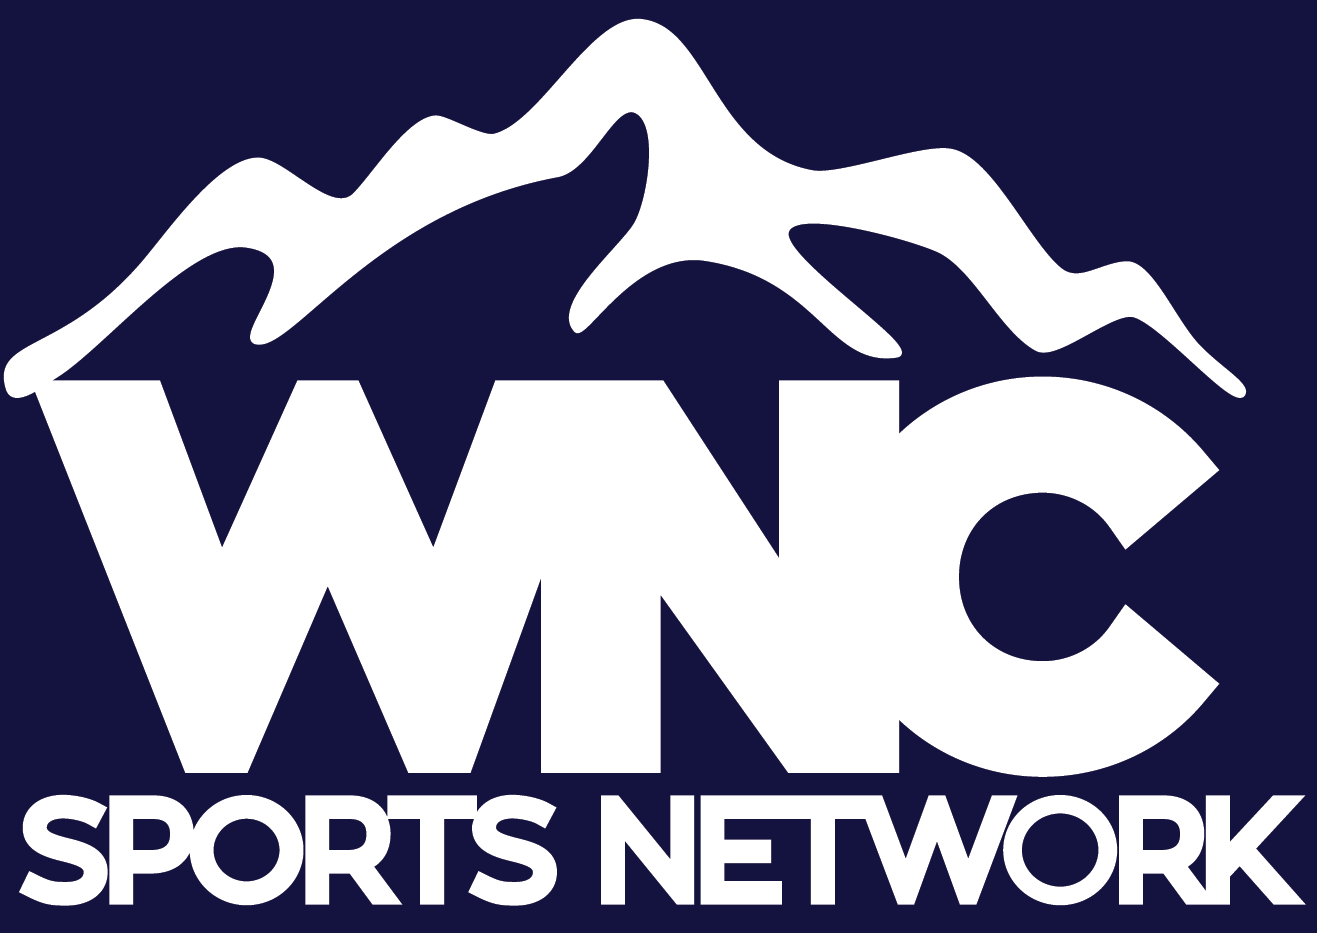 WNC Sports Network